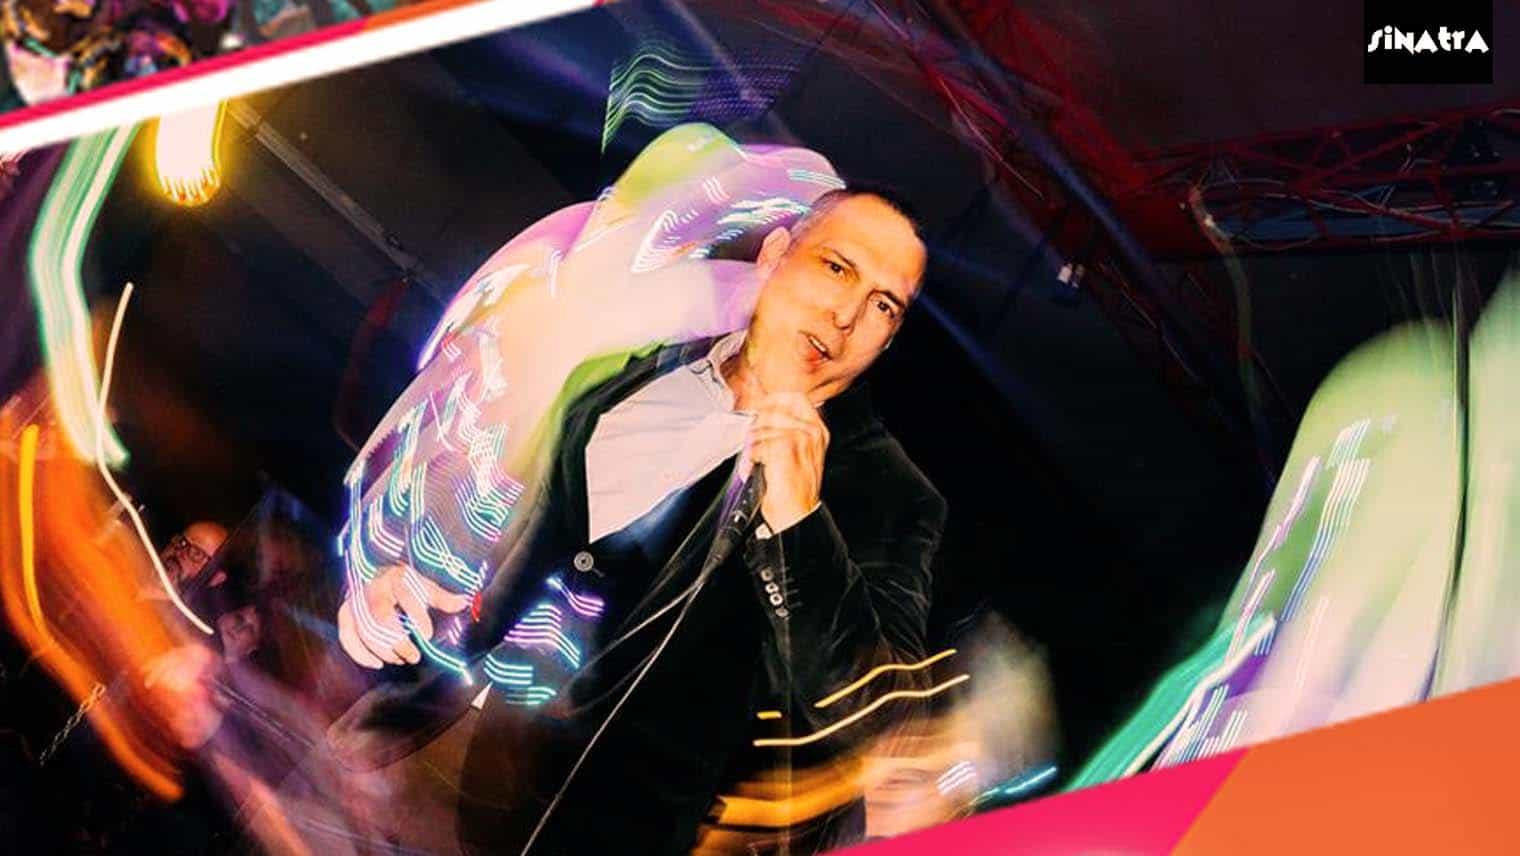 vocalist_in_discoteca_circular_feeling_clubbing_culture_sinatra_ferrara_club.jpg